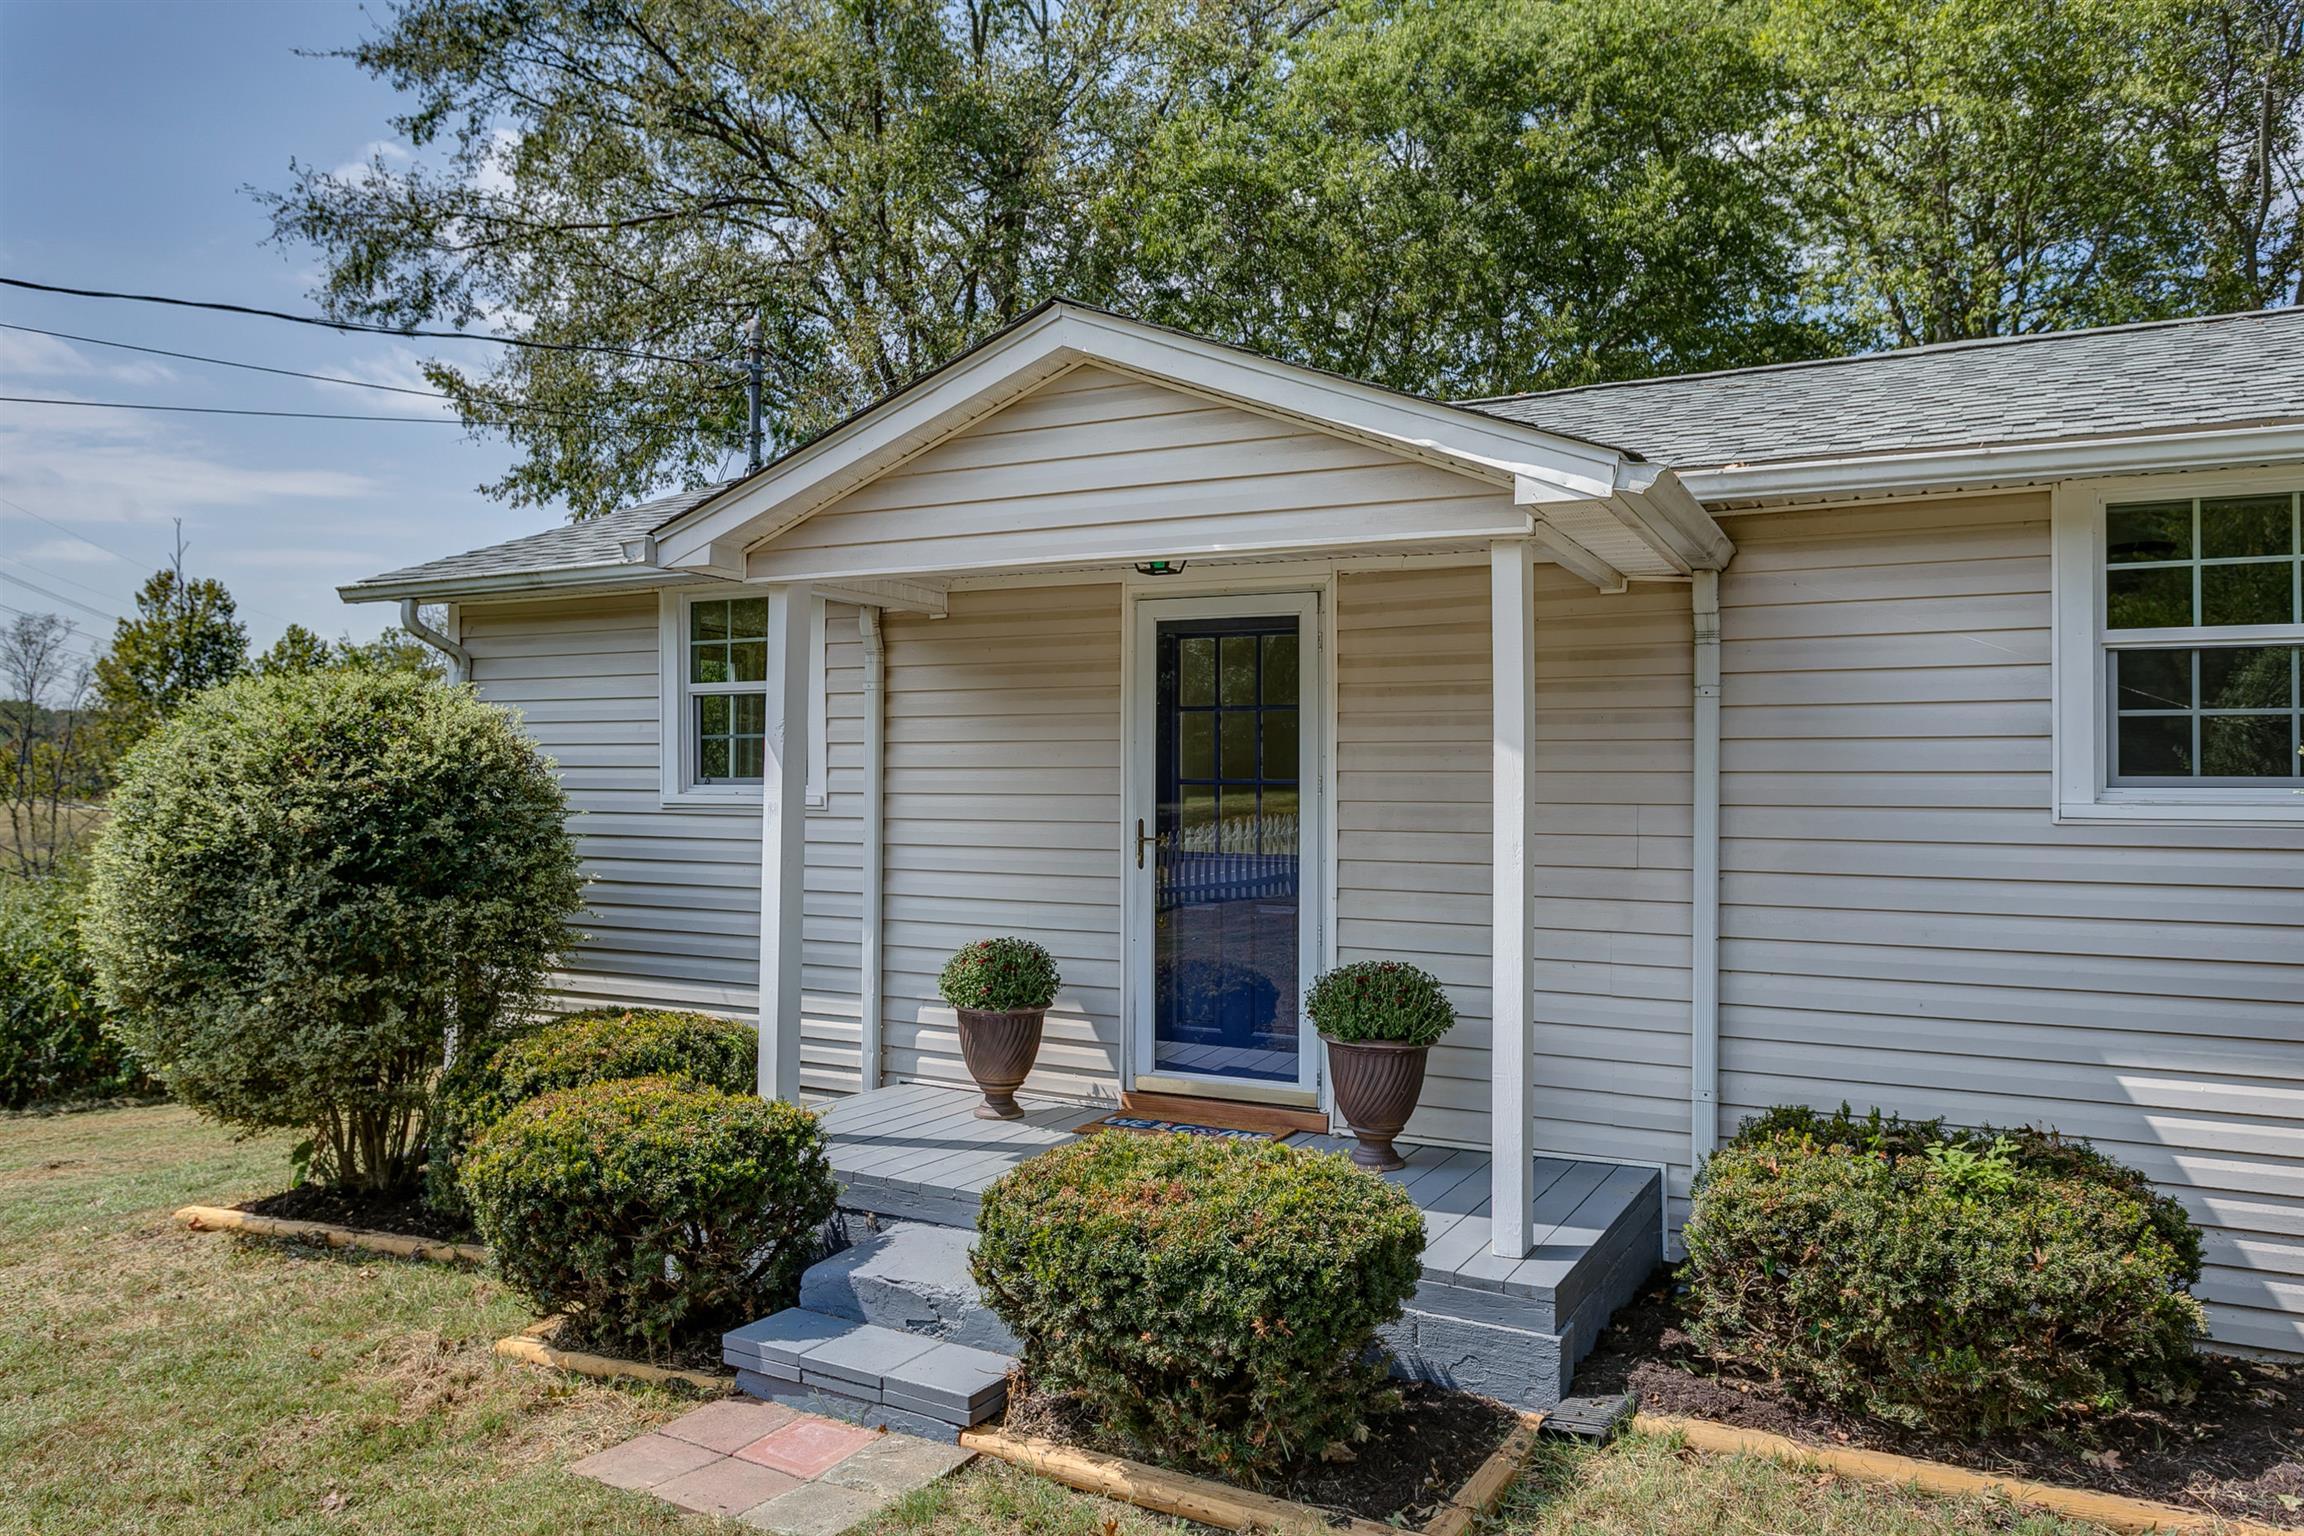 000 Real Estate Listings Main Image